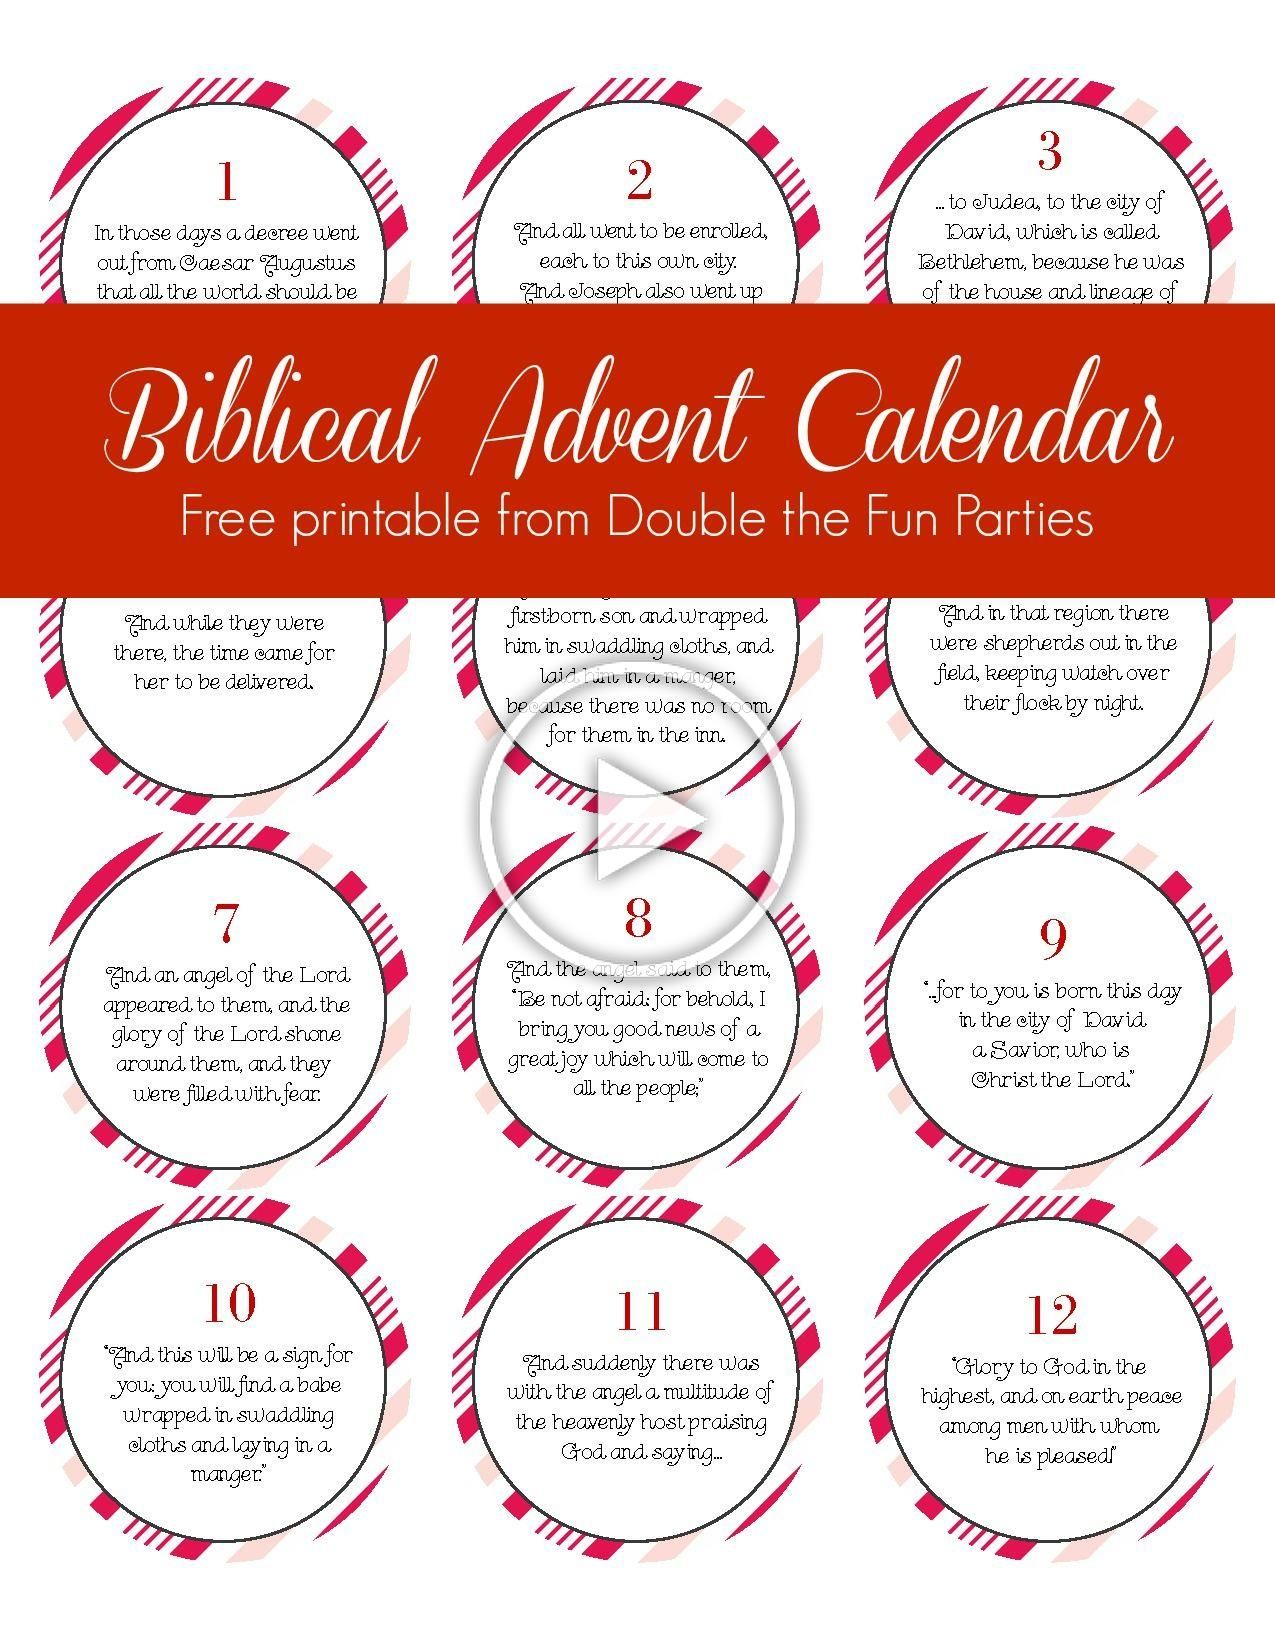 Biblical Advent Calendar Free Printable By Double The Fun